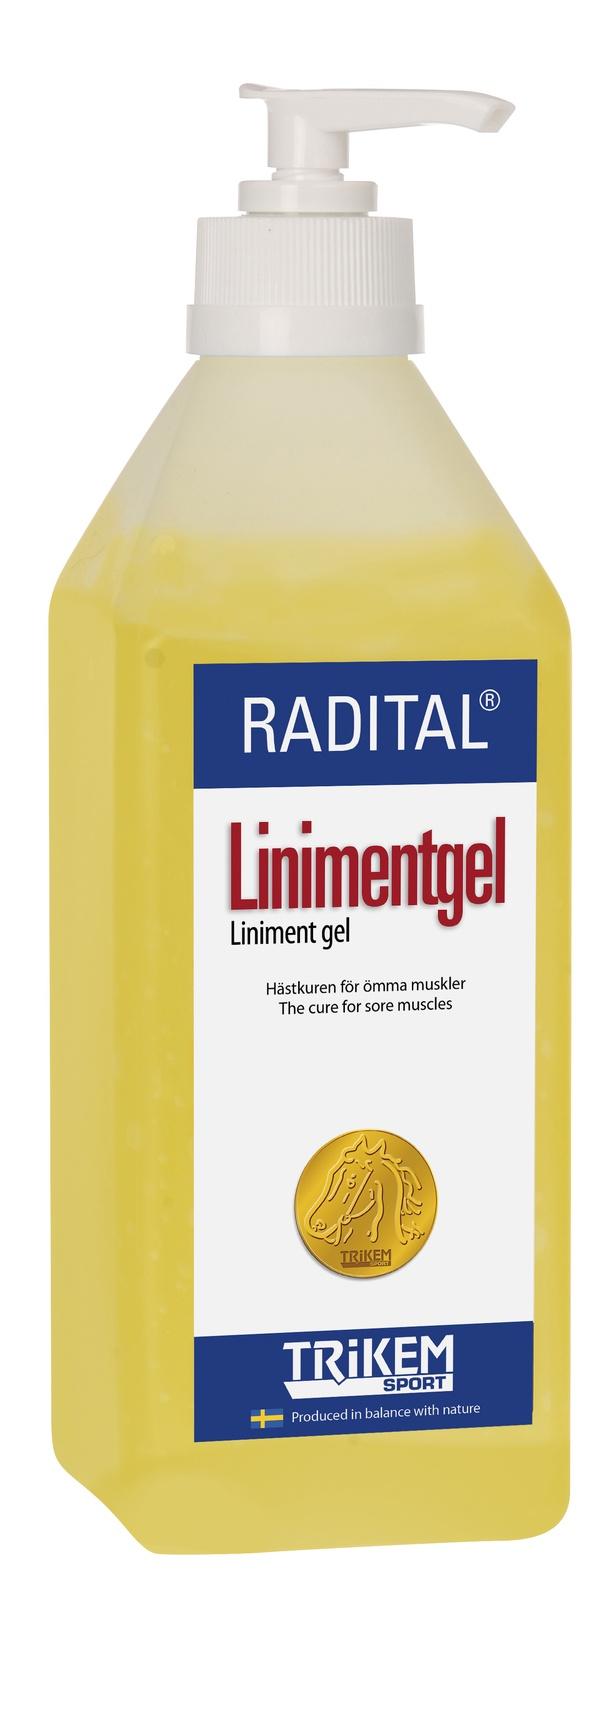 TRIKEM LINIMENTGEL - 600 ML